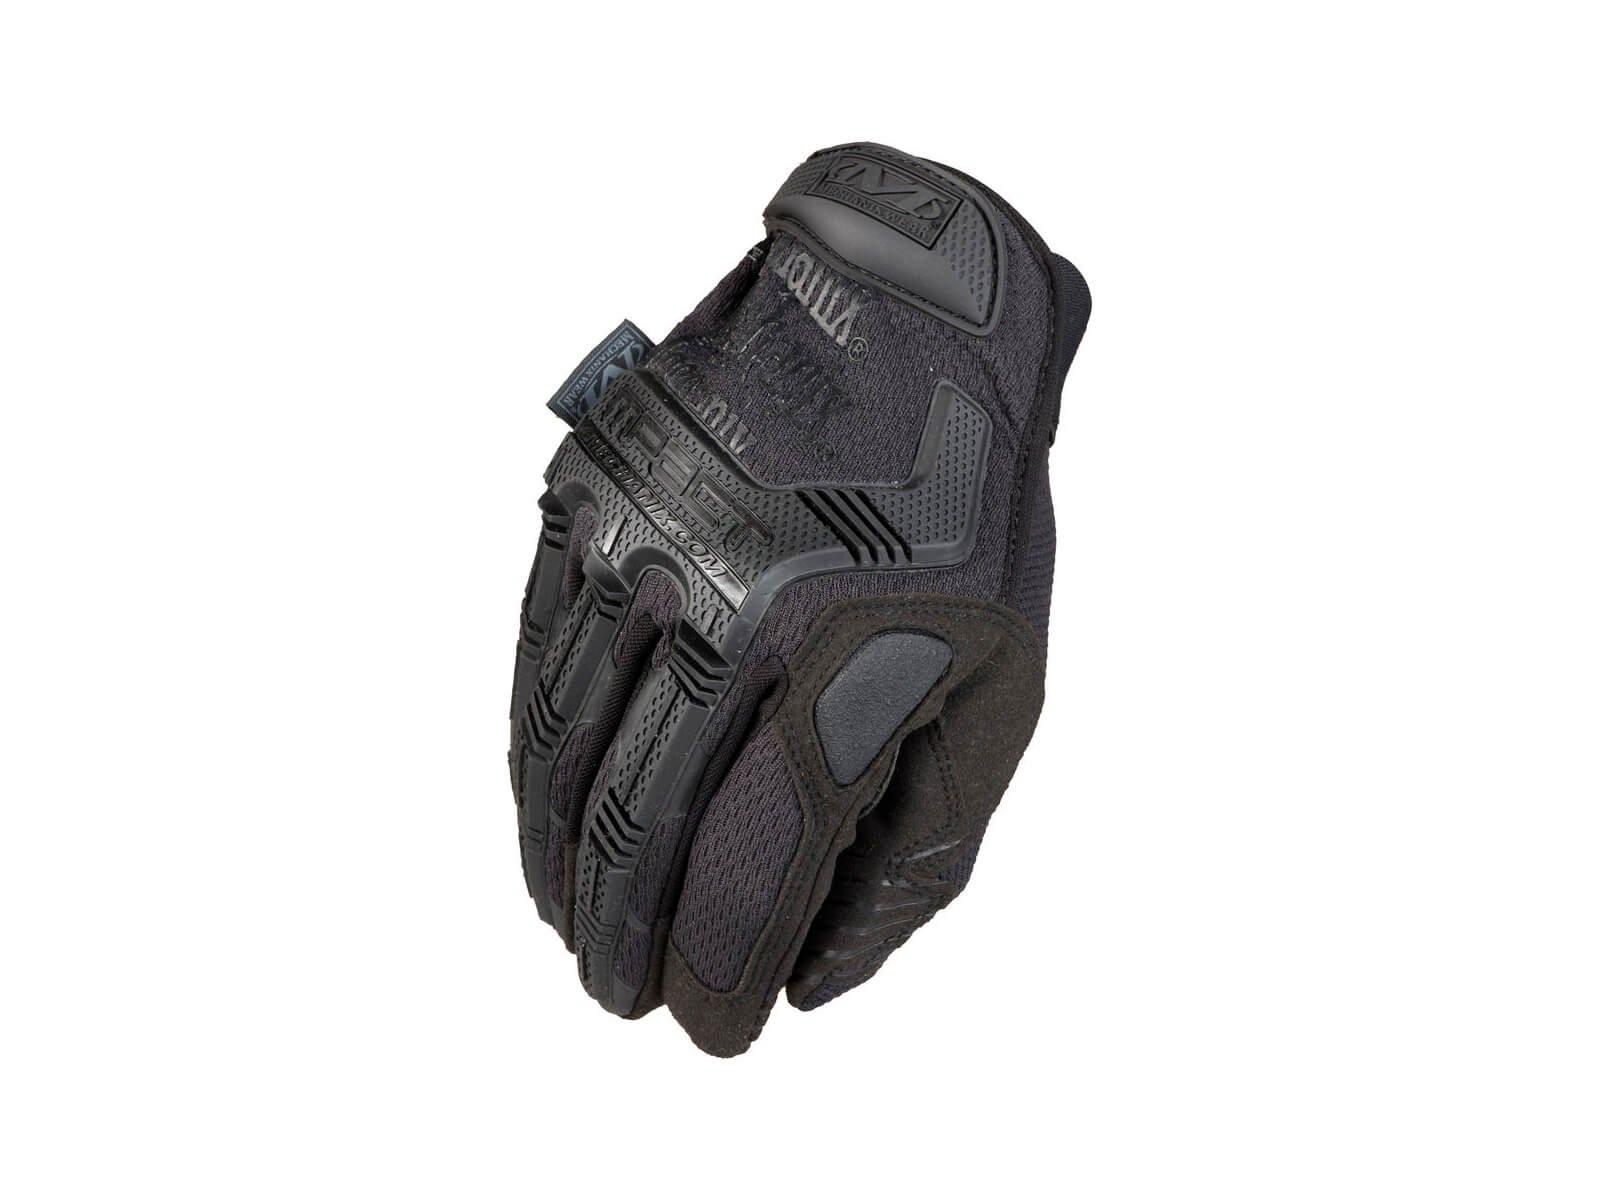 Mechanix handske M-pact, Sort